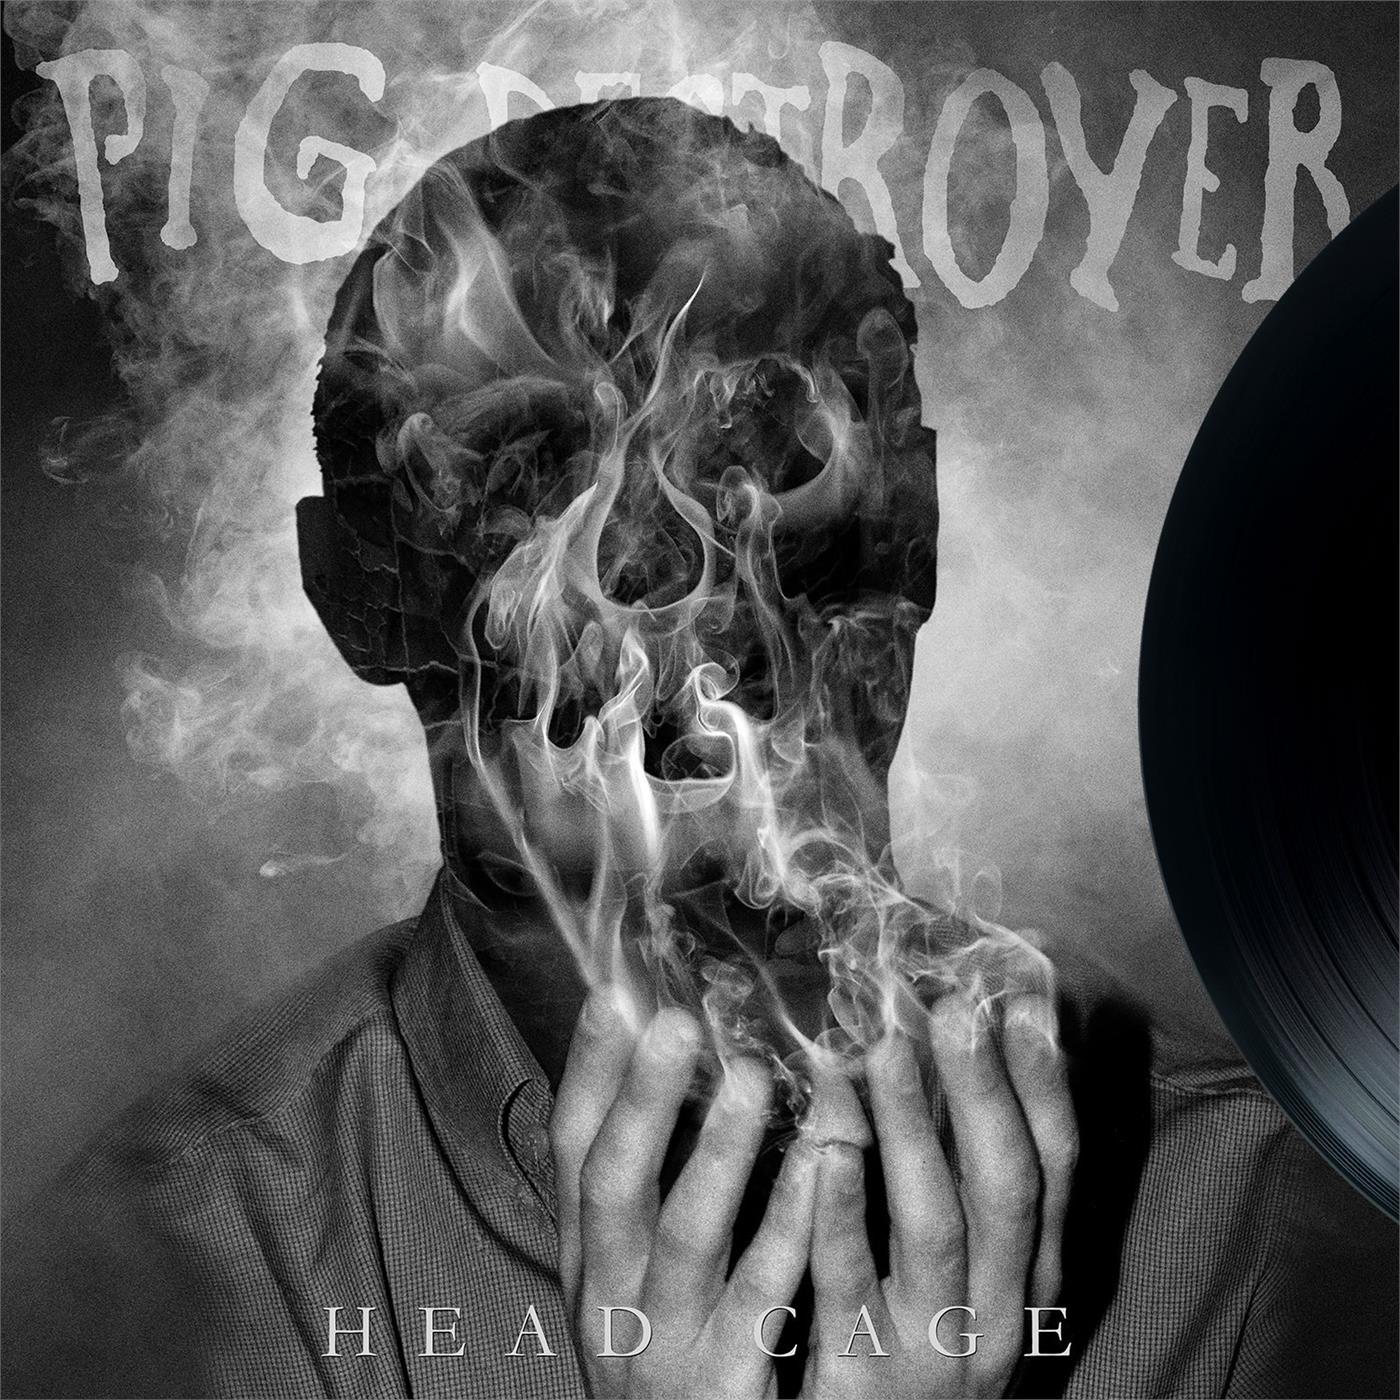 Pig Destroyer - Head Cage [LP]